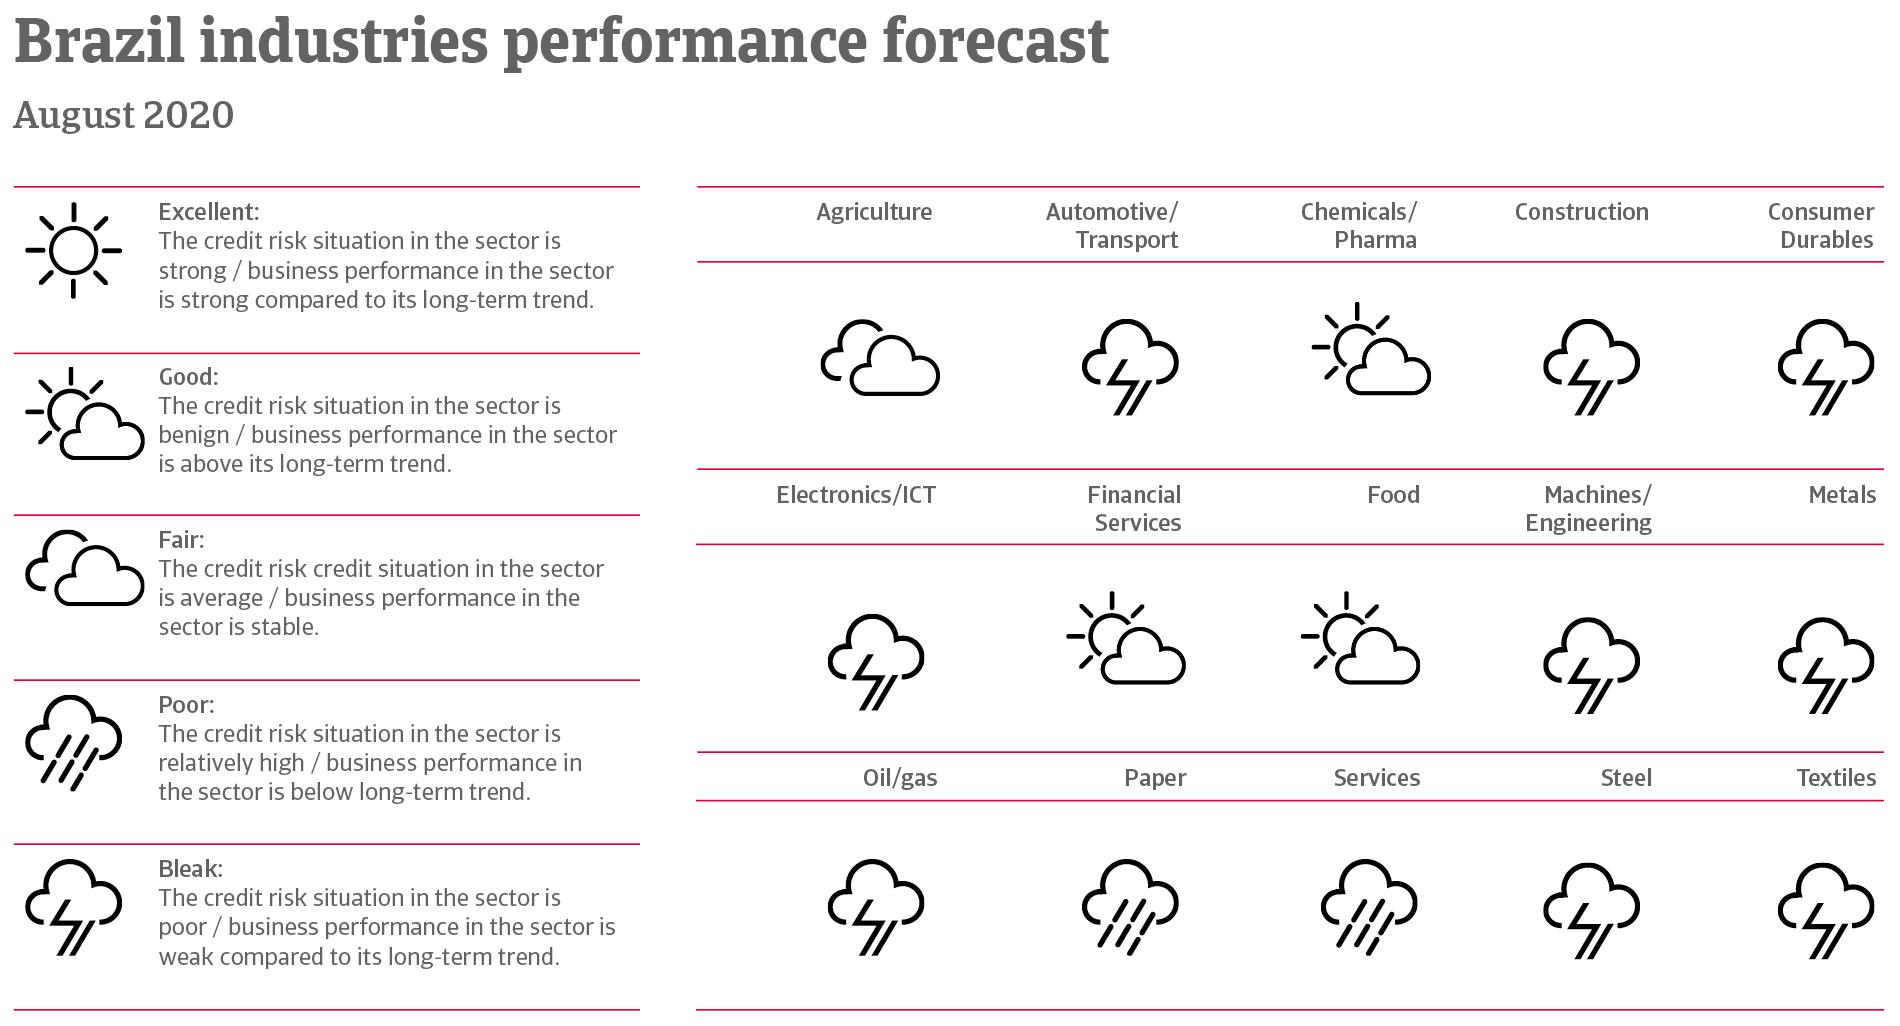 Performance forecast of Brazilian industries